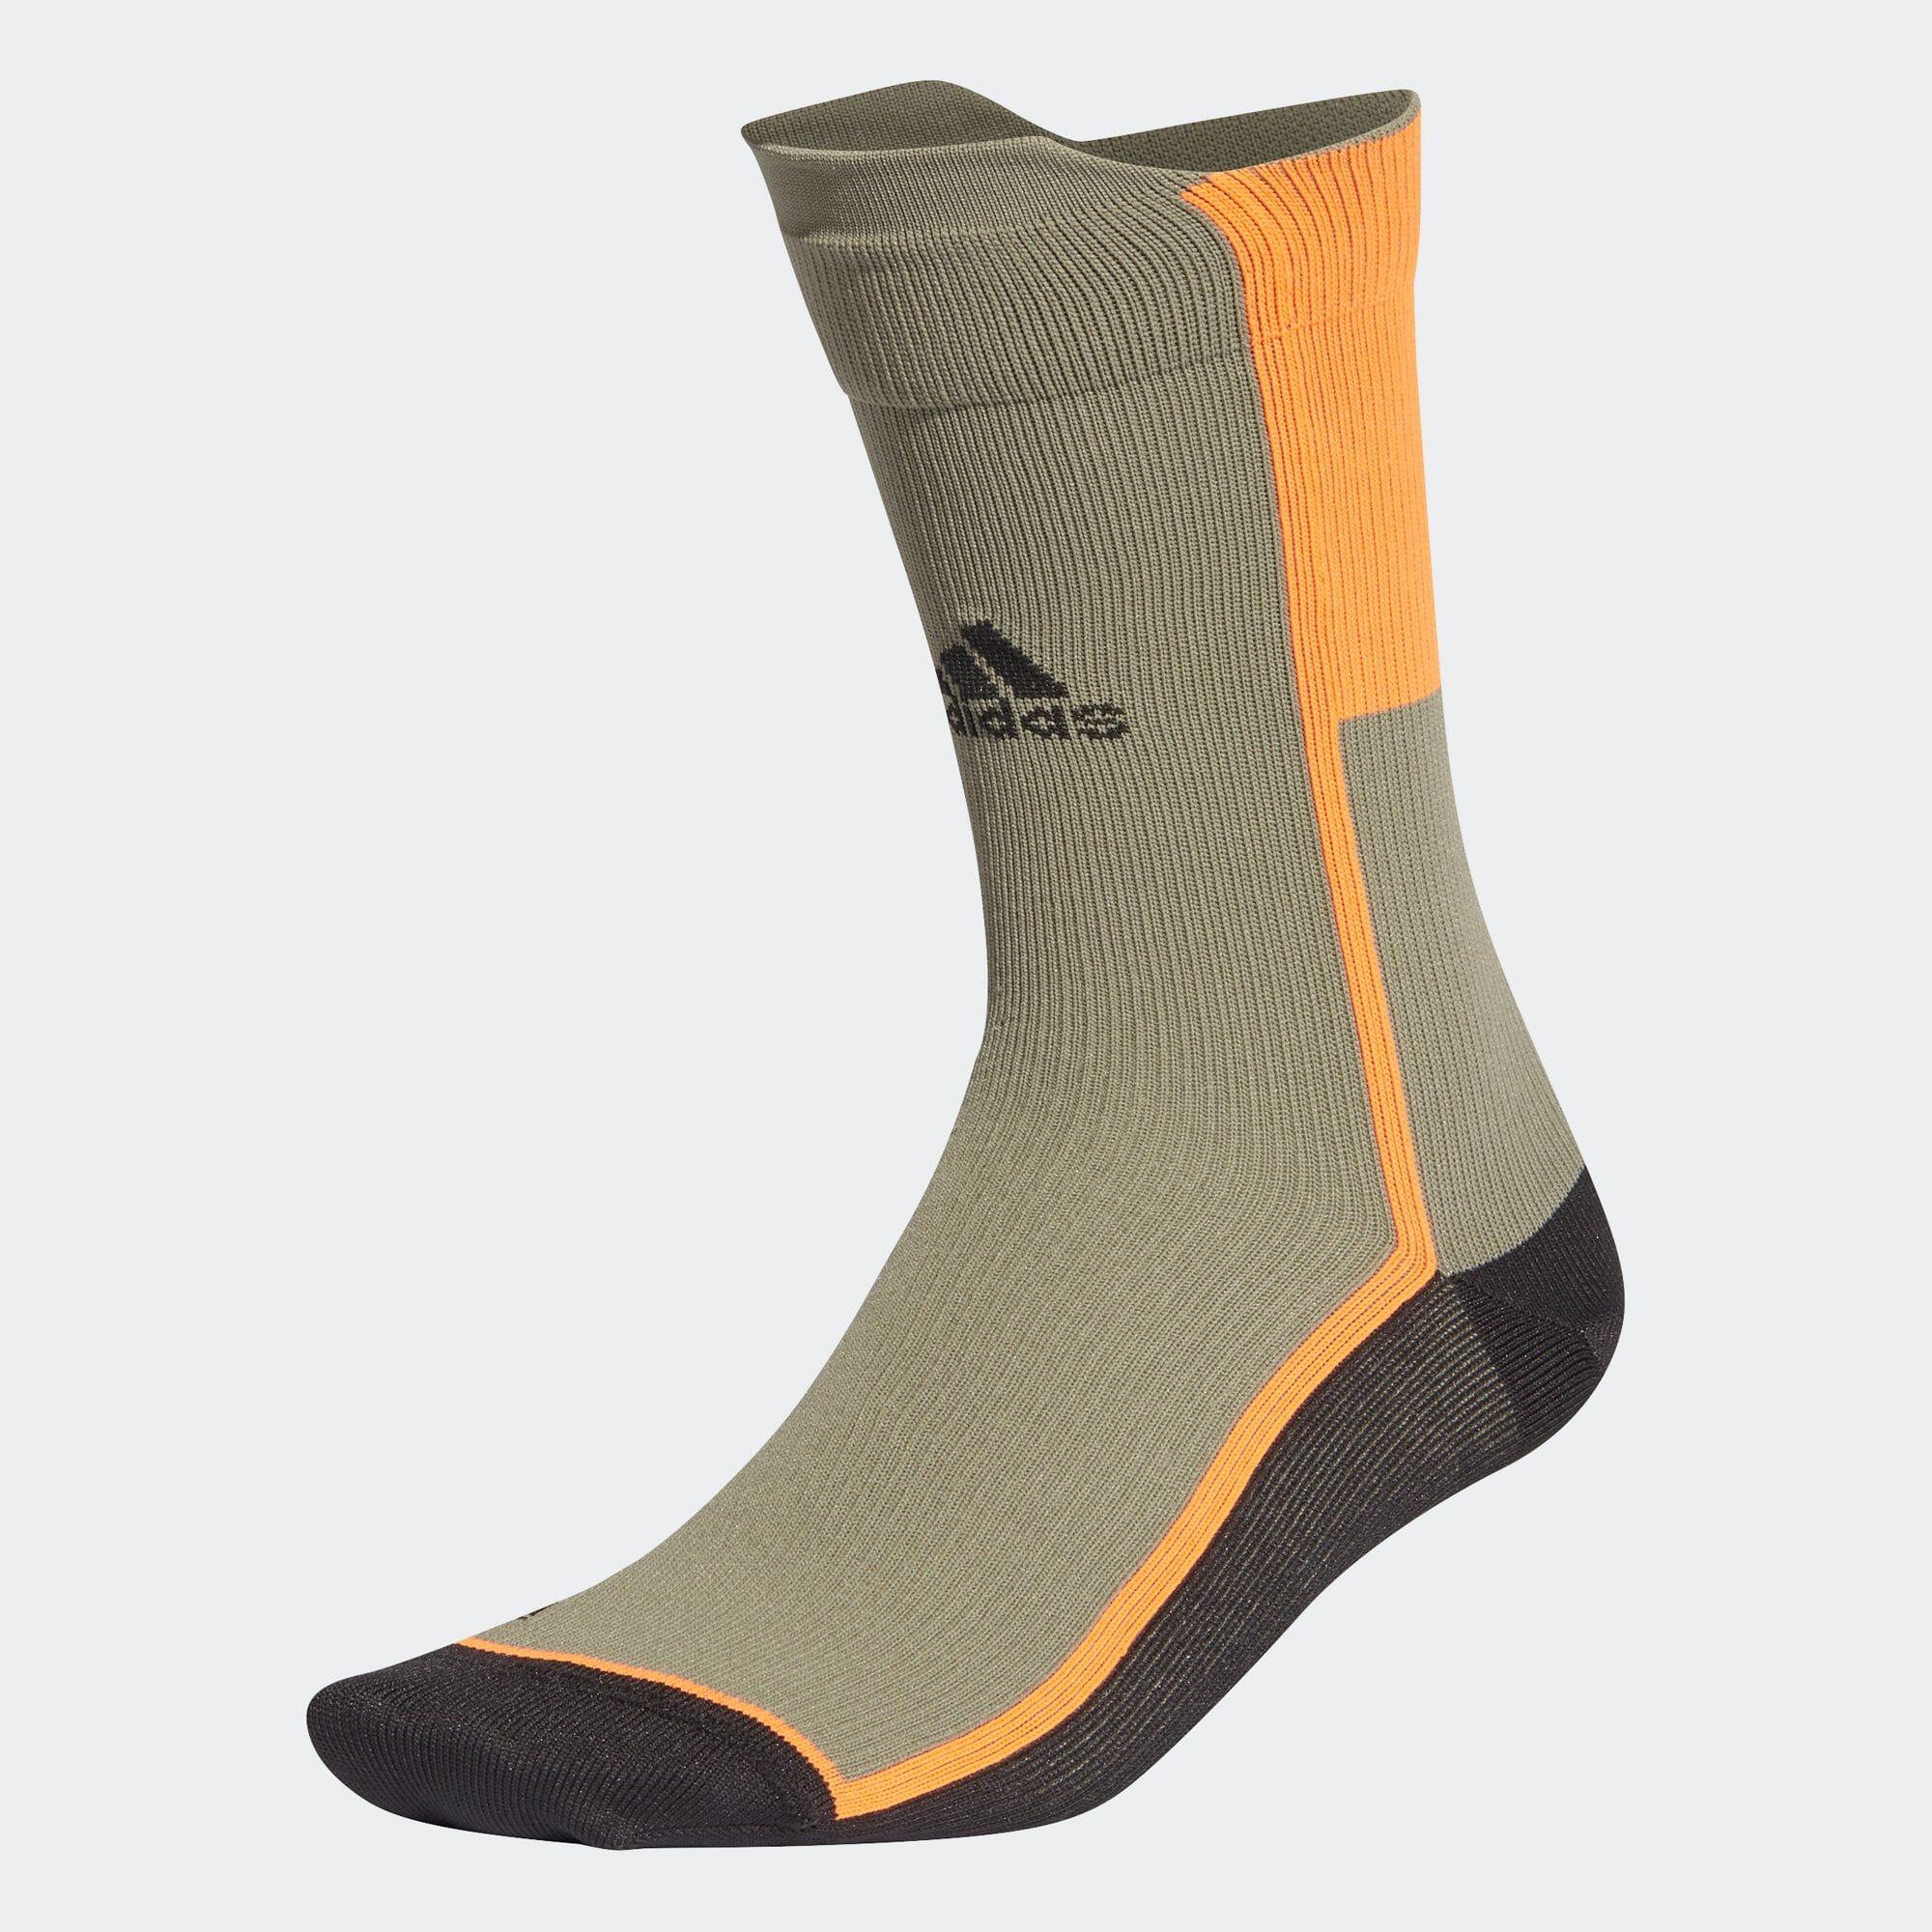 ALPHASKIN ウルトラライト パフォーマンス クルーソックス / Alphaskin Ultralight Performance Crew Socks